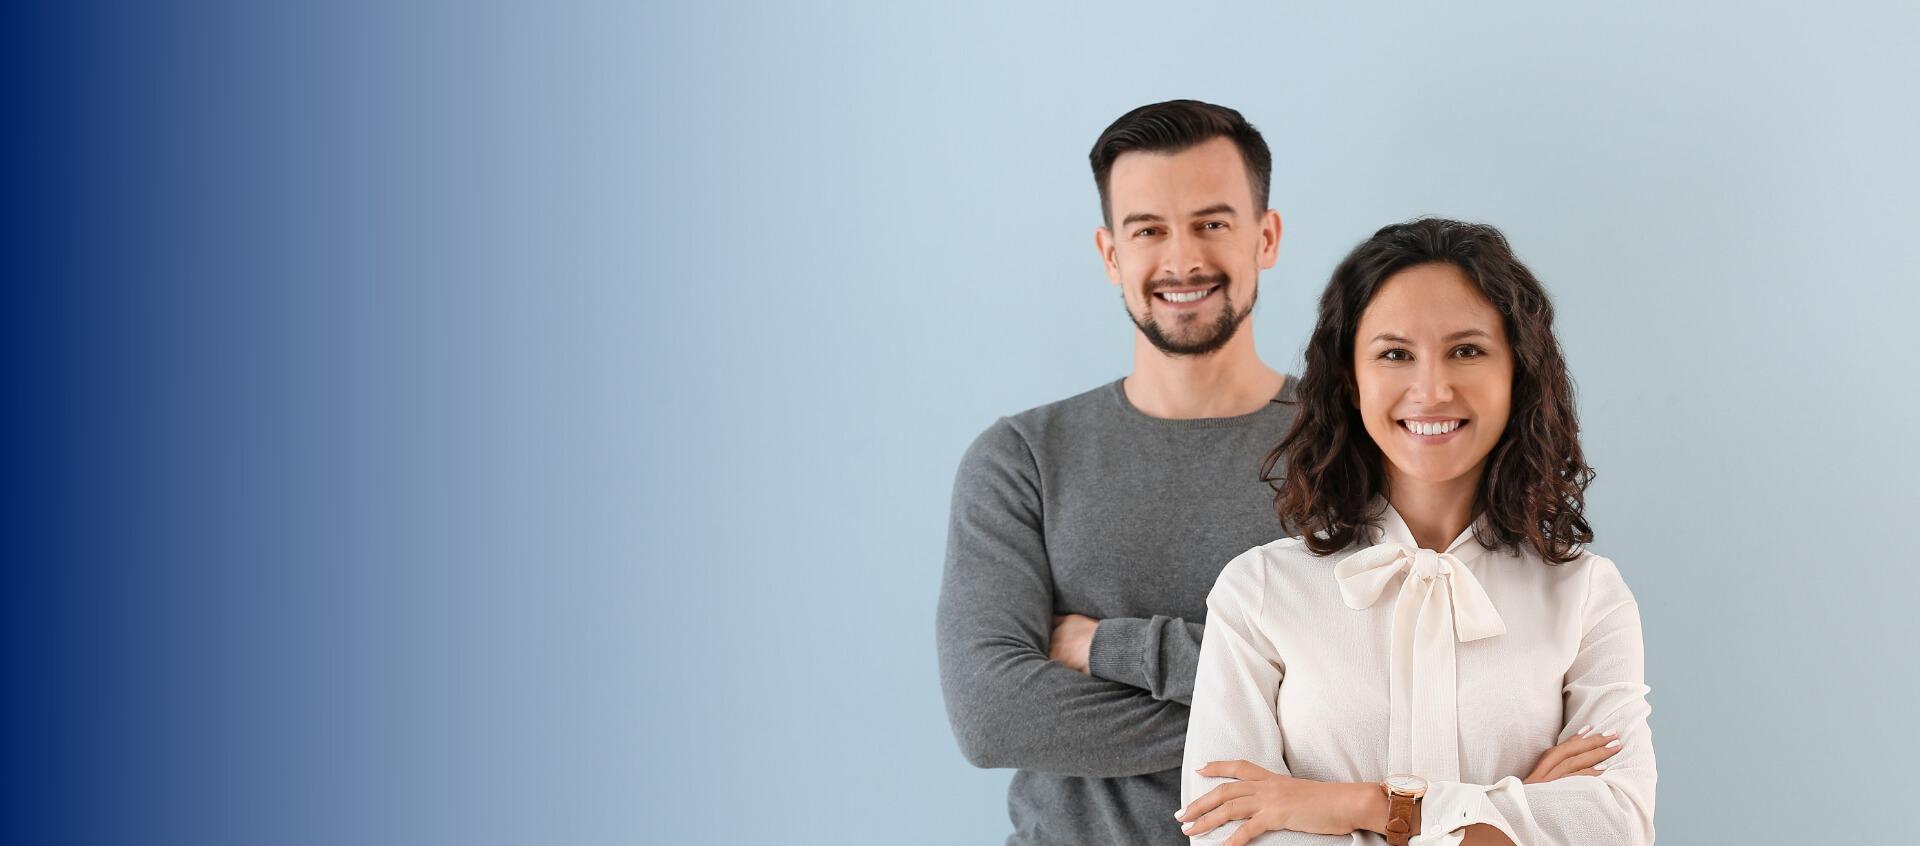 Homme et femme souriant